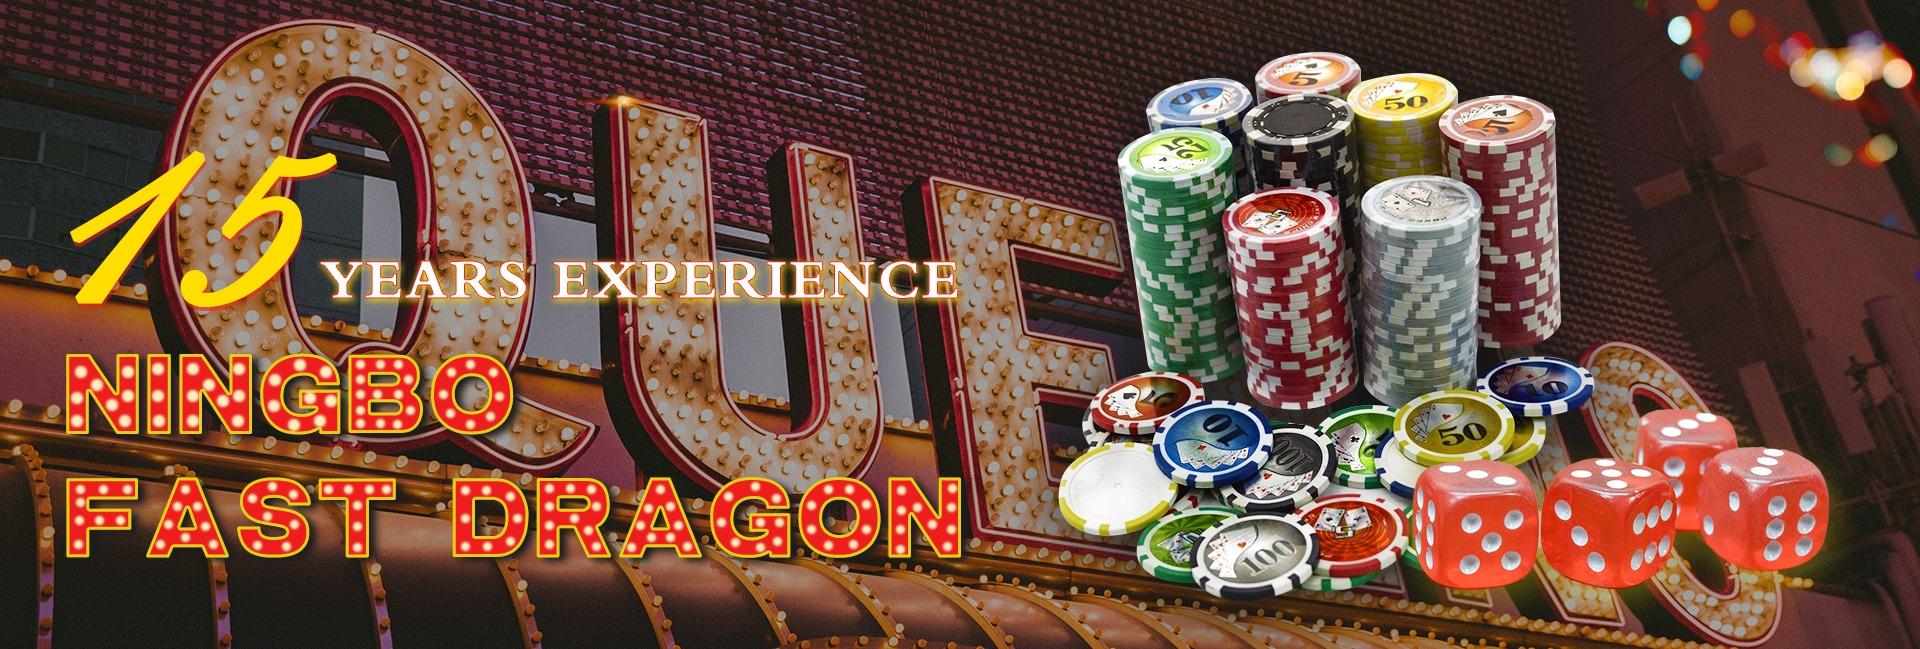 Ningbo Fast Dragon Trading Co Ltd Kitchen Appliance Entertainment